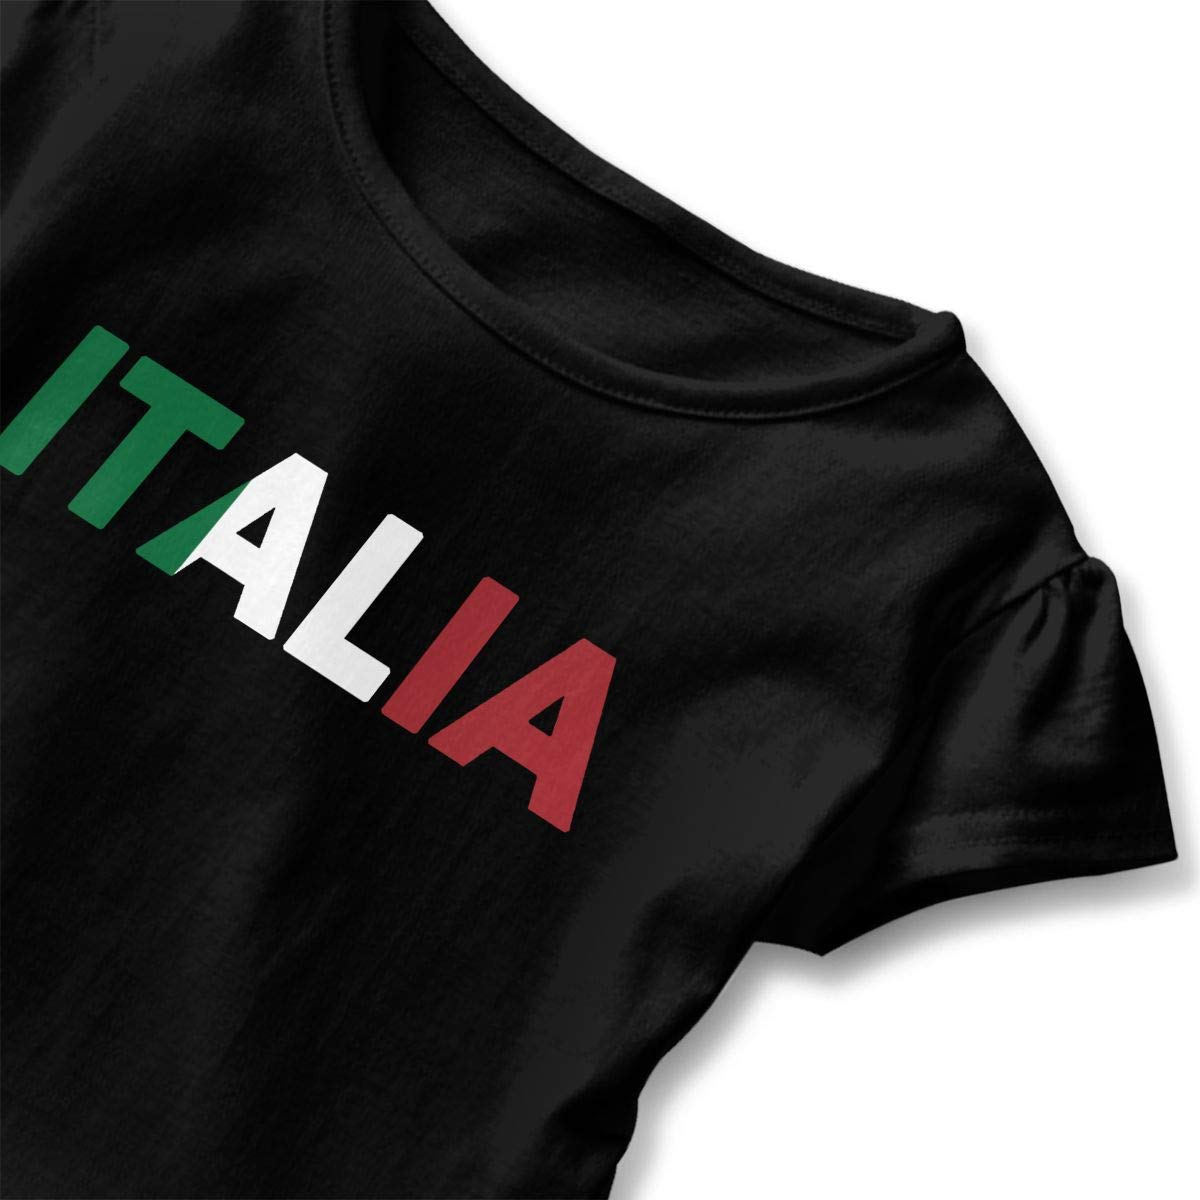 QUZtww Italia Italy Italian Flag Toddler Baby Girl Basic Printed Ruffle Short Sleeve Cotton T Shirts Tops Tee Clothes Black